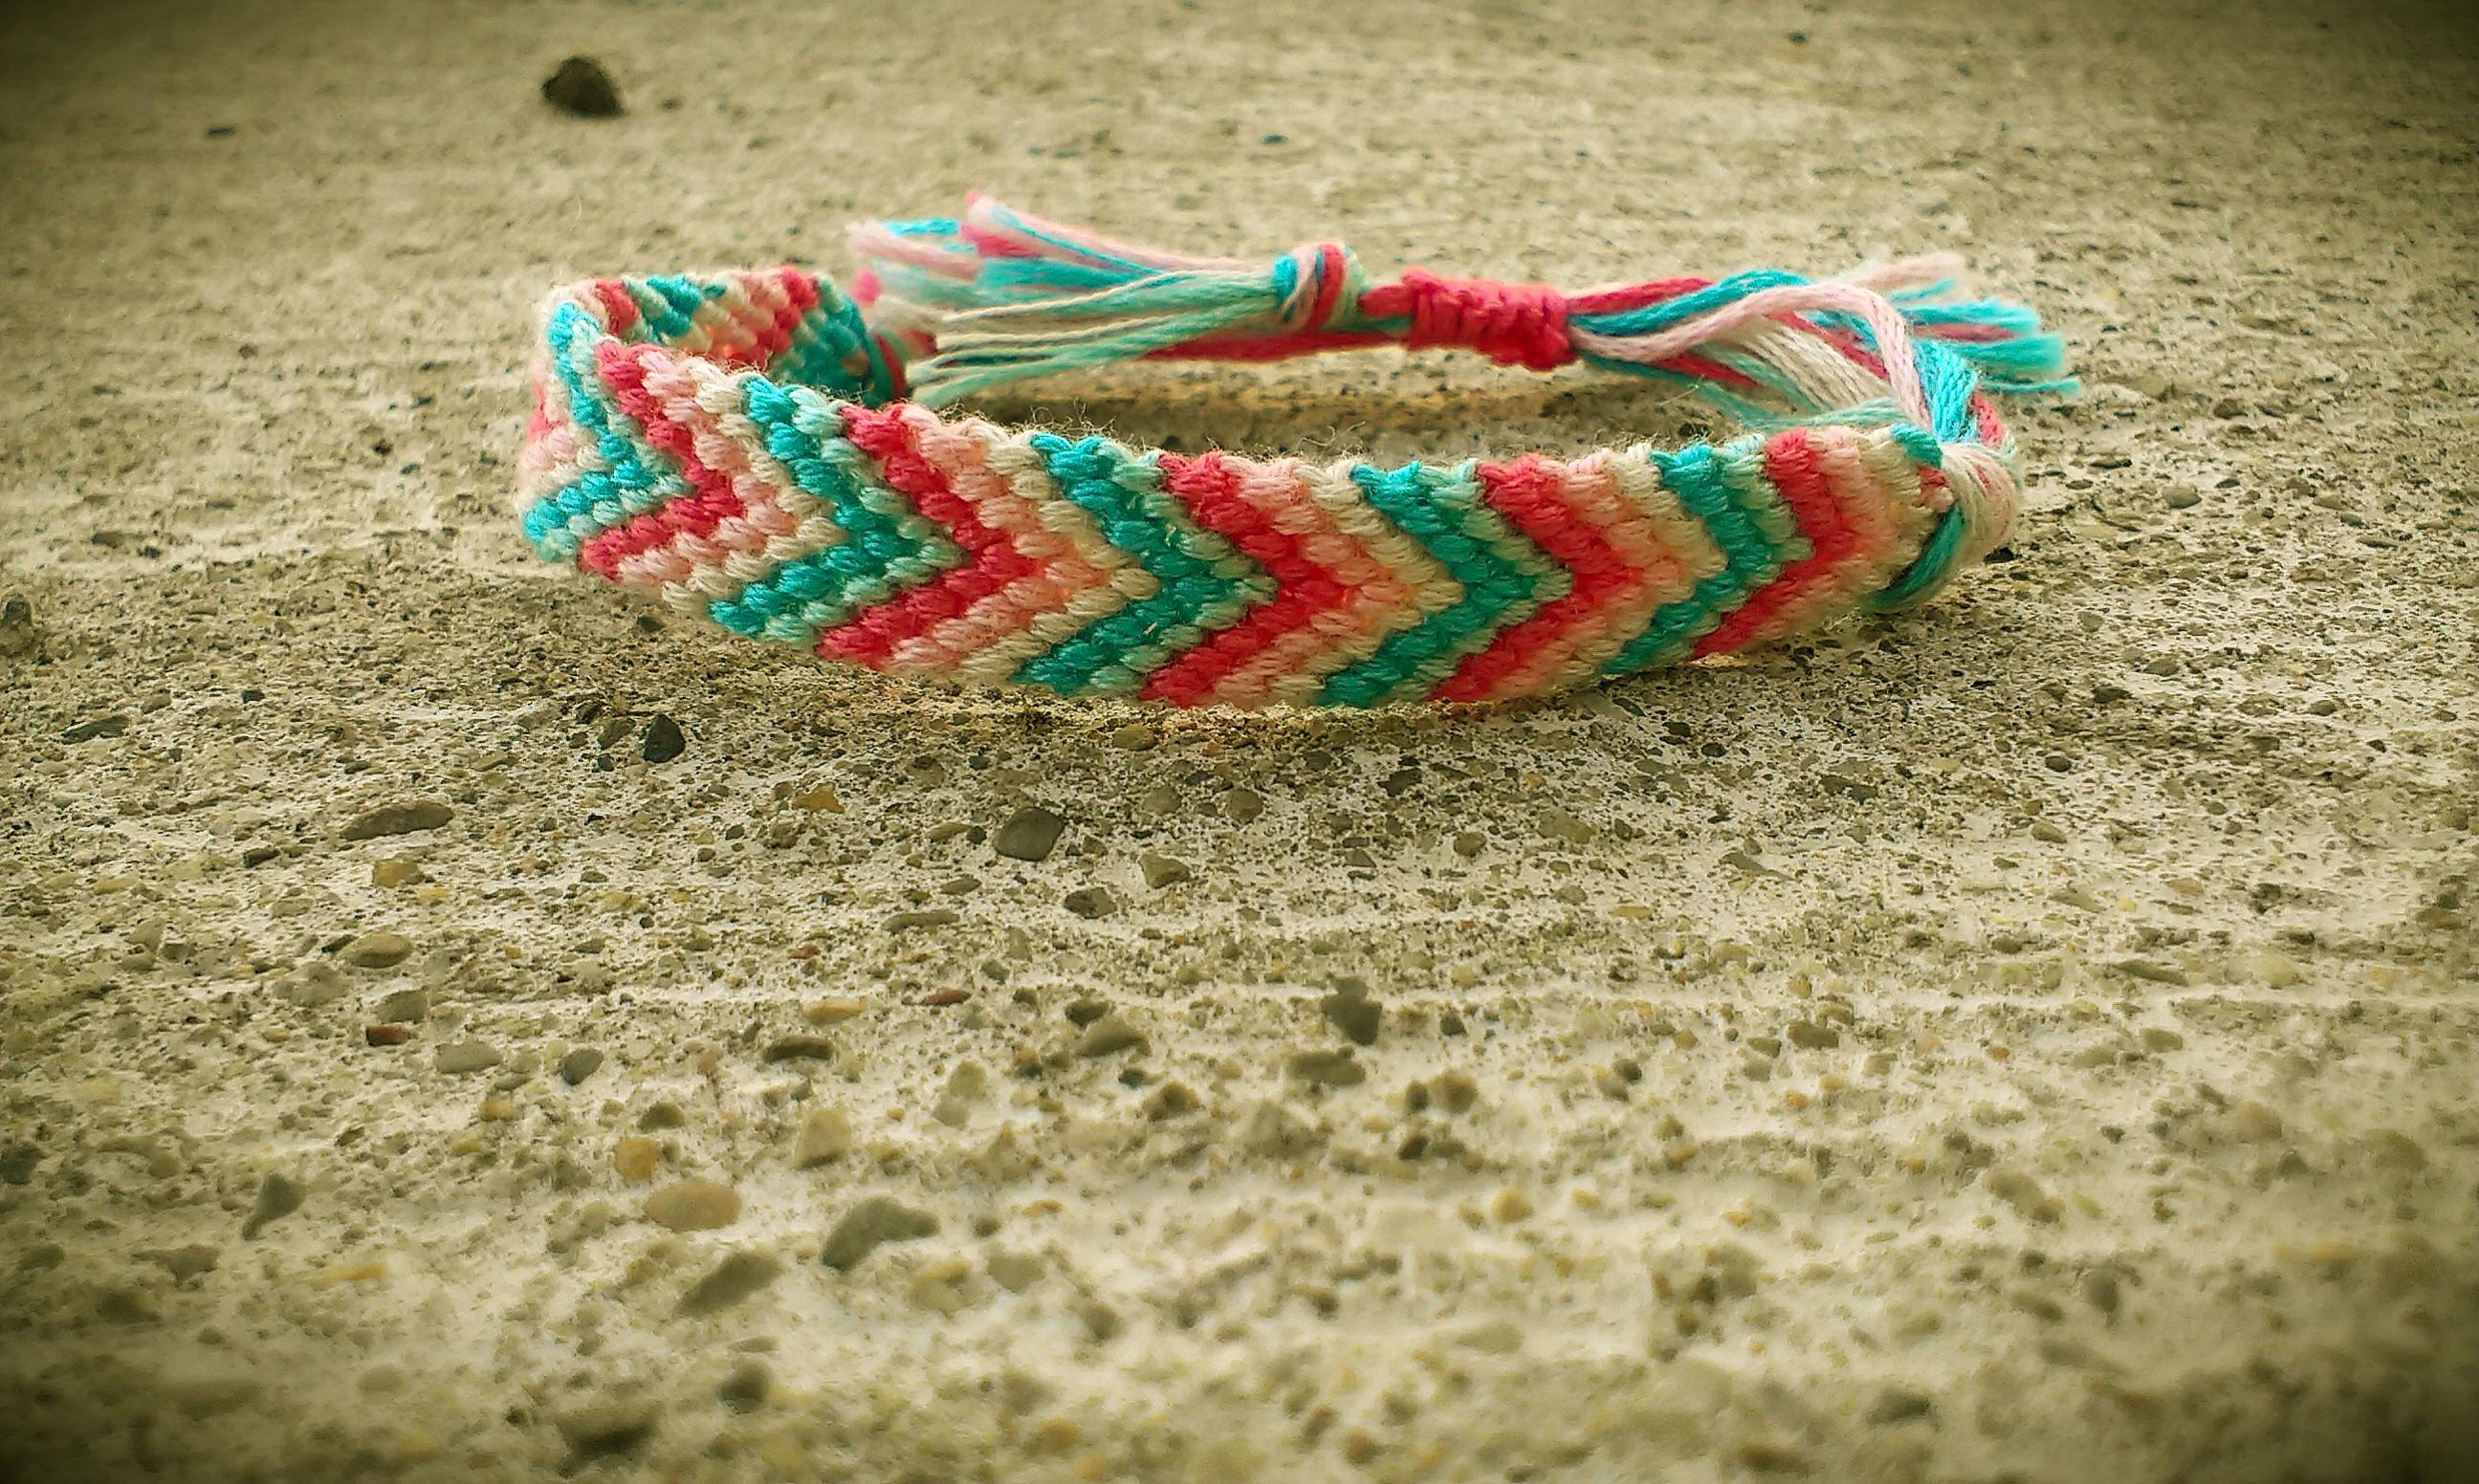 Chevron bracelet - Chevron Friendship Bracelet Cotton Candy